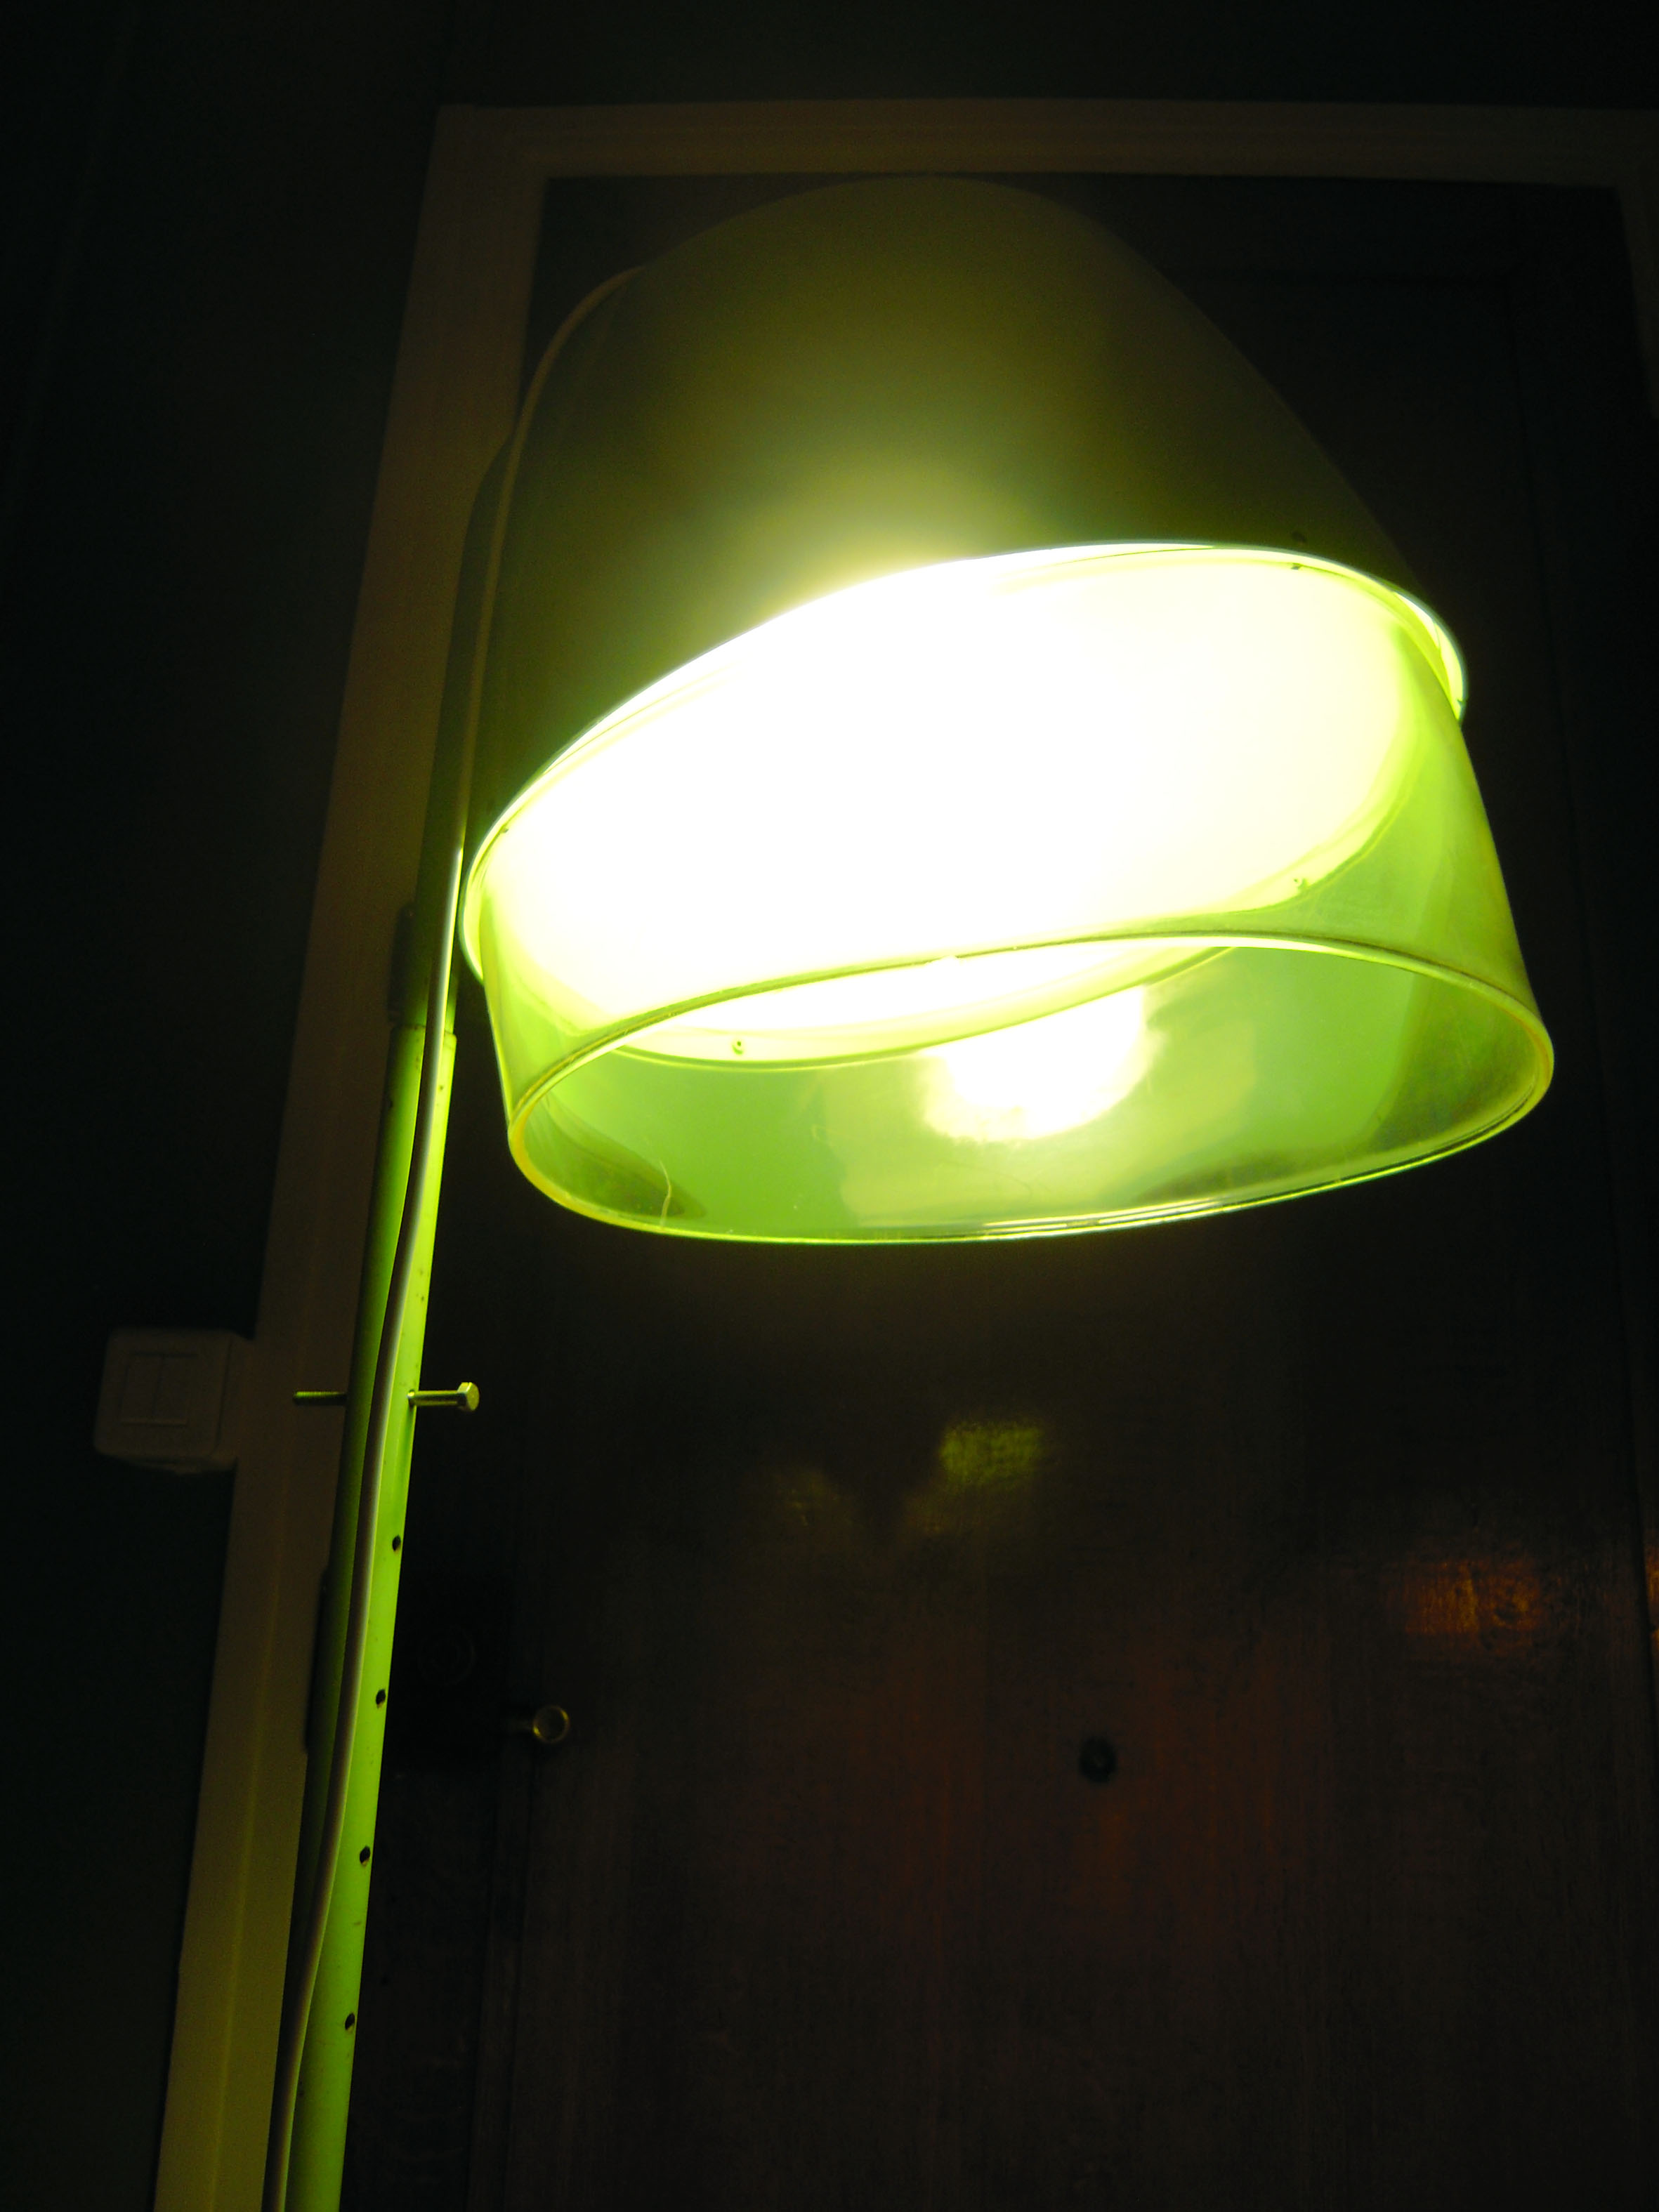 ancien casque s che cheveux lampe pied transformation objet salon halog ne luminaire adopte. Black Bedroom Furniture Sets. Home Design Ideas